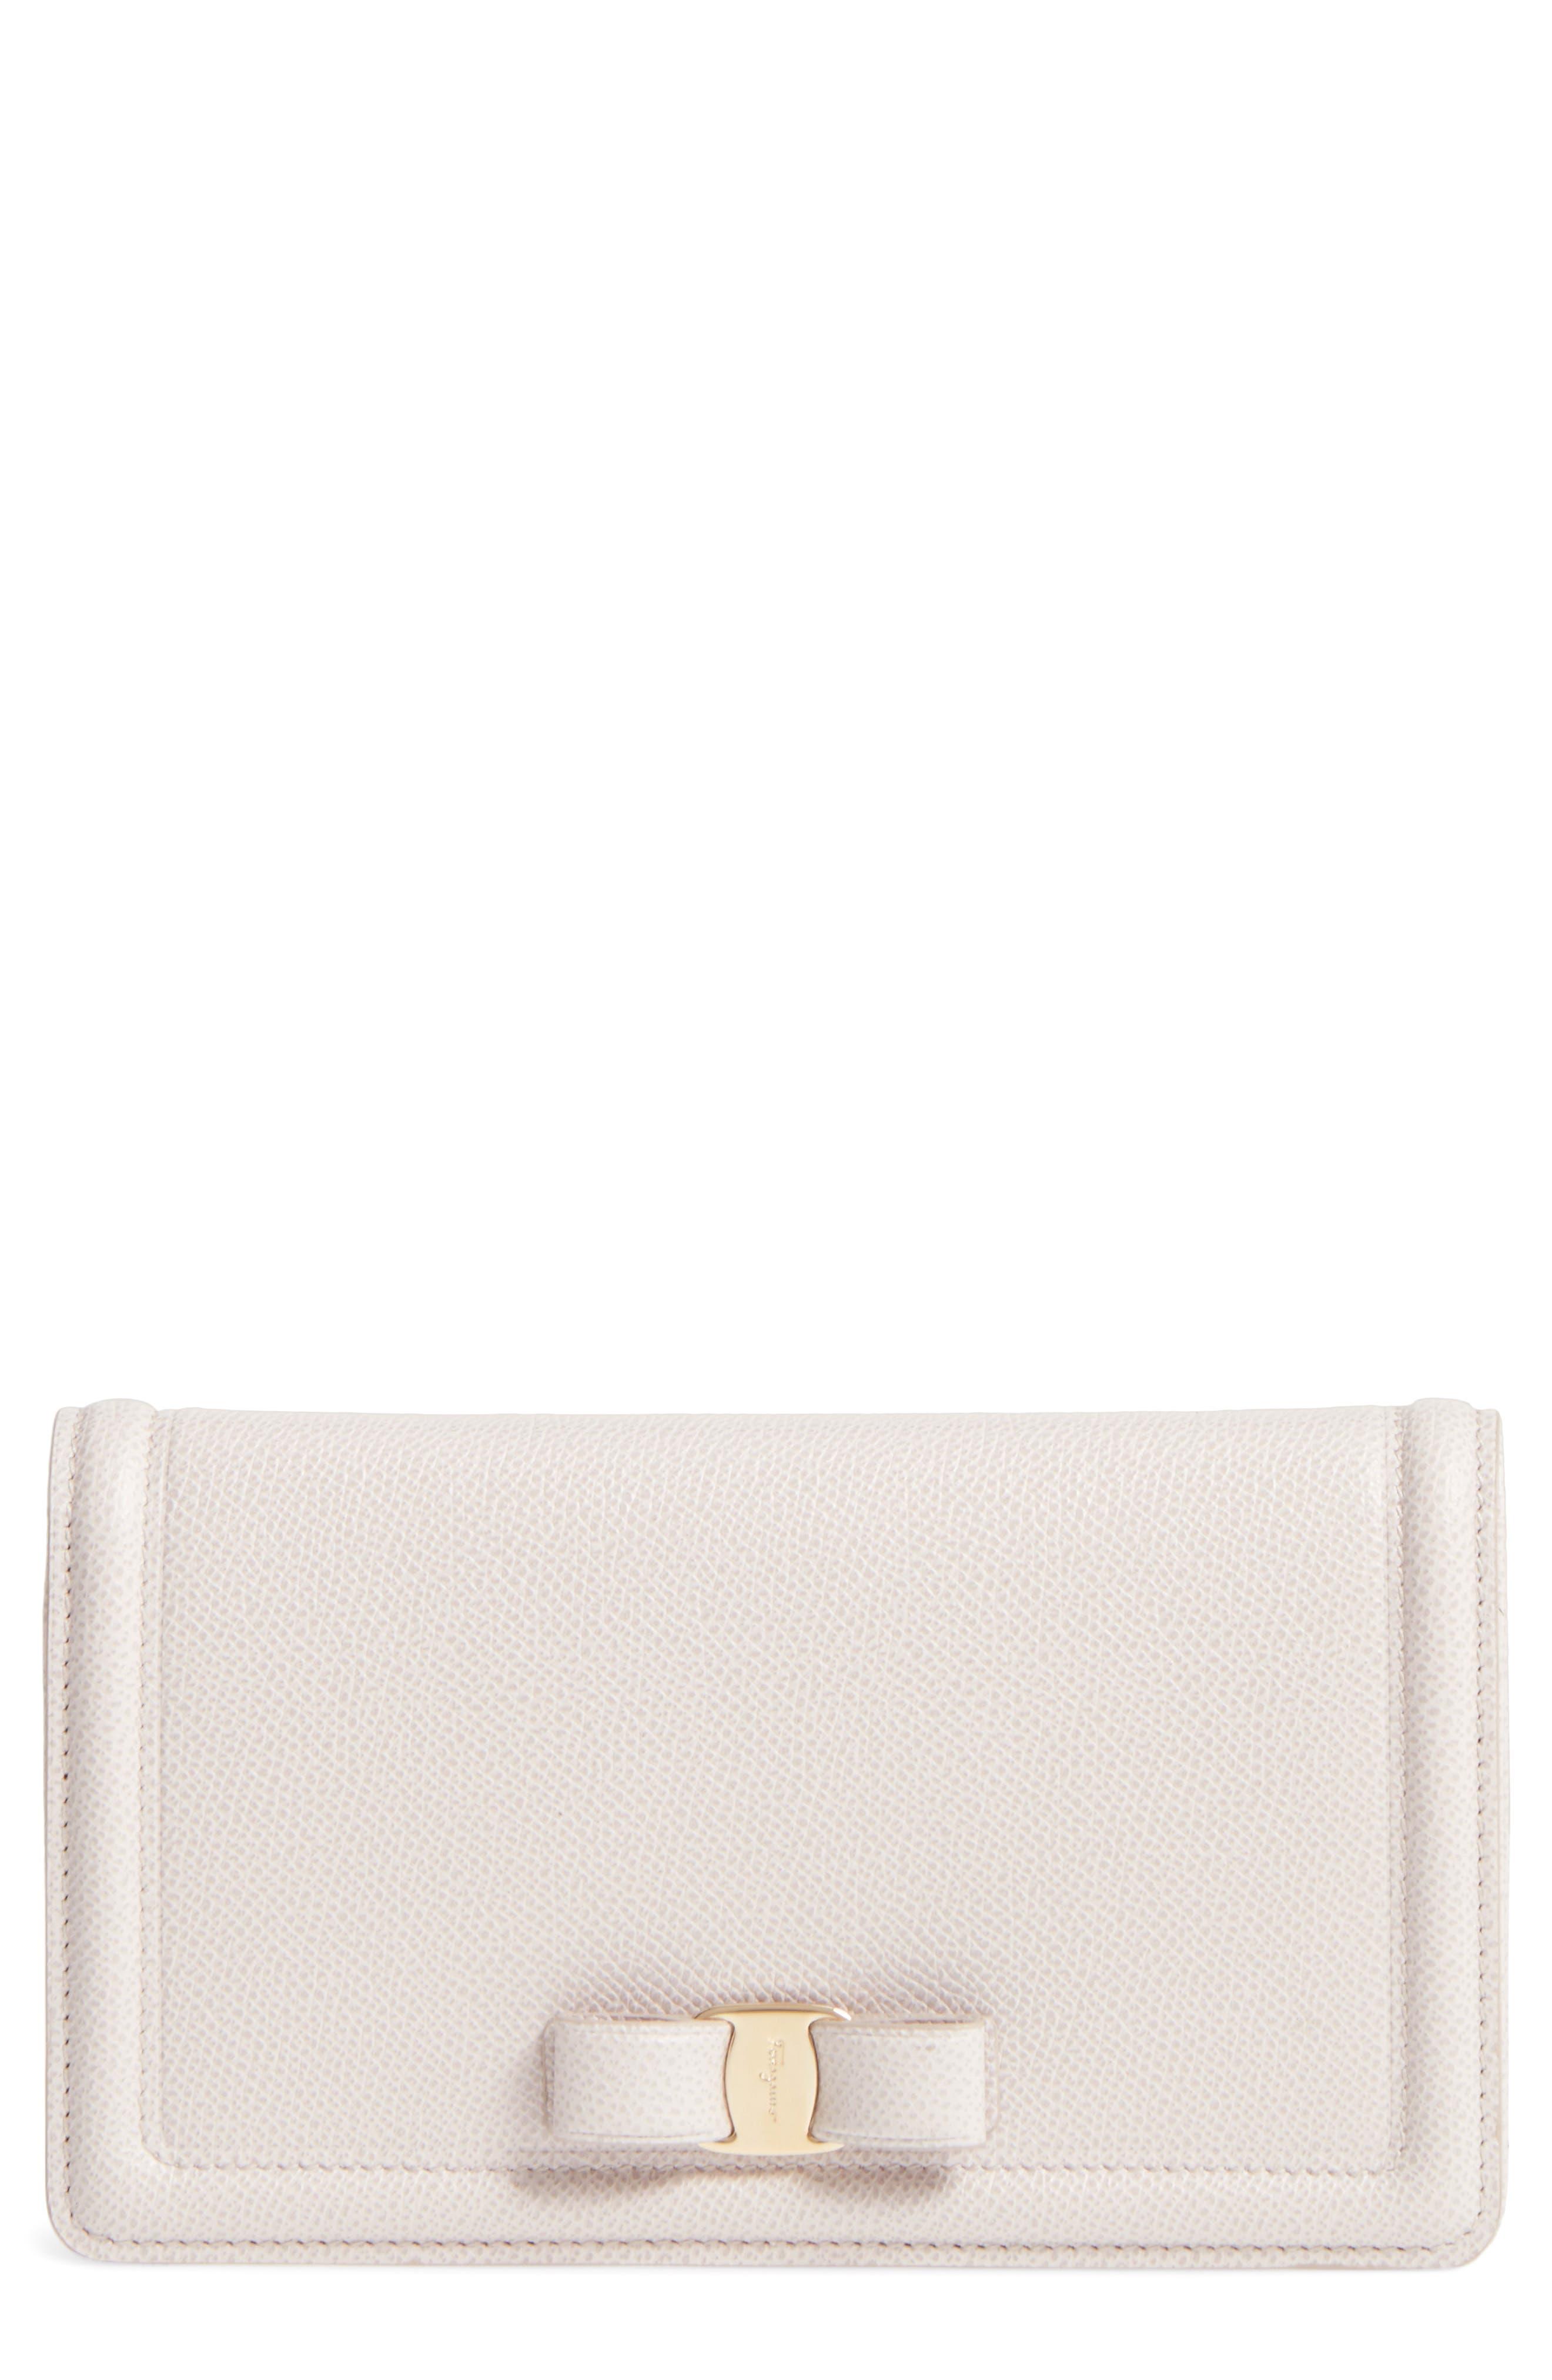 Salvatore Ferragamo Vara Leather Wallet on a Chain